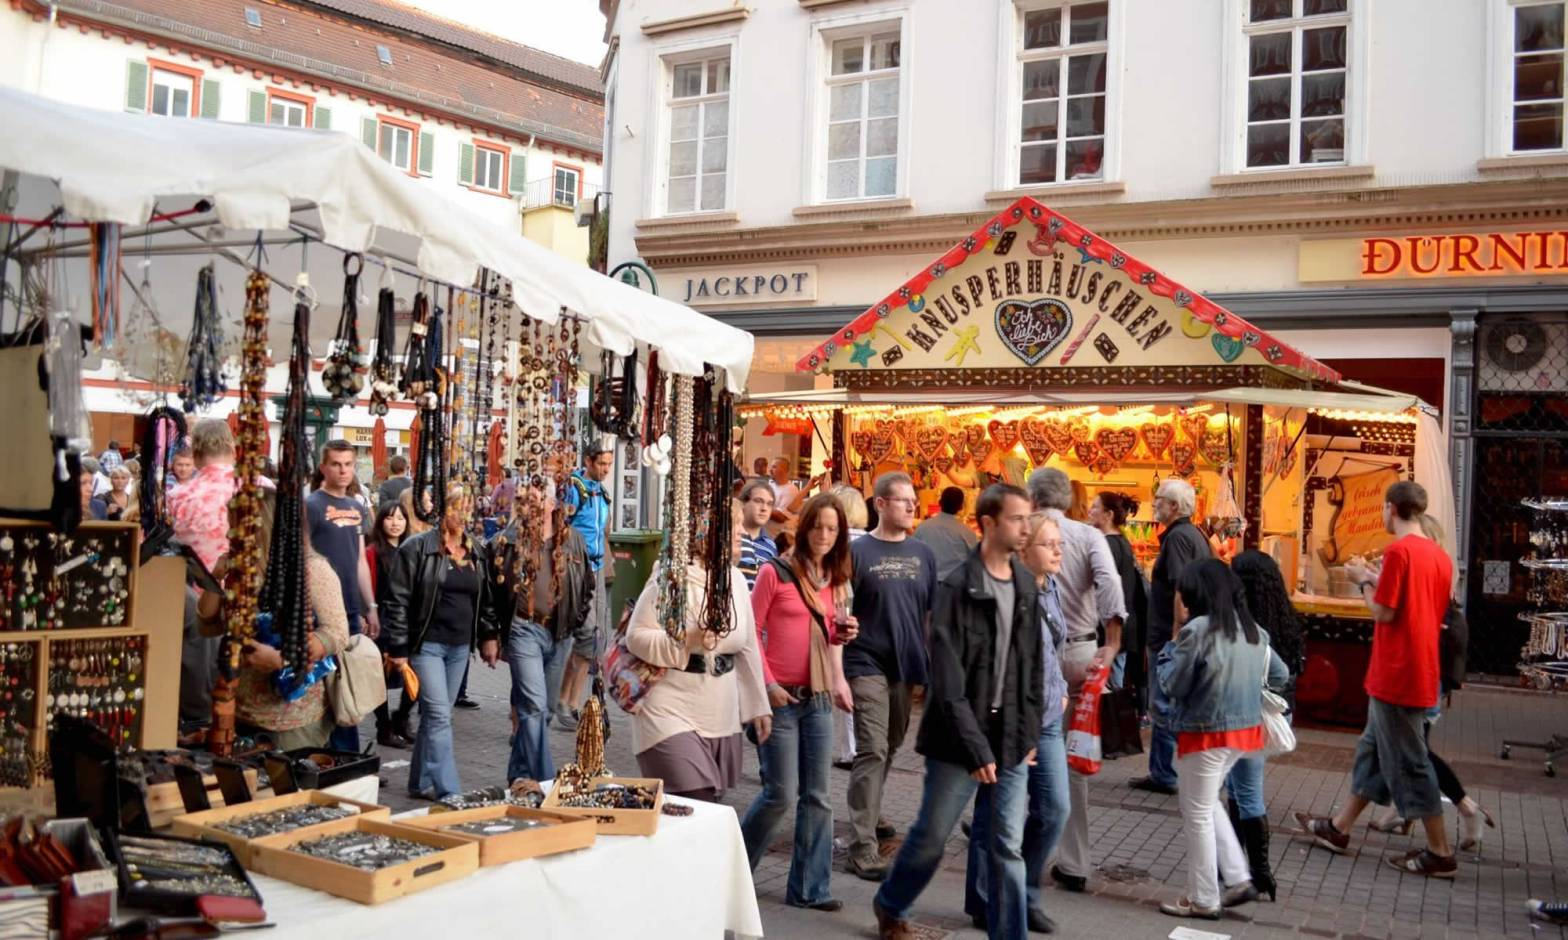 People walk the Hauptstrasse, Heidelberg's pedestrianized street, at the annual Herbstfest (Autumn Fest).